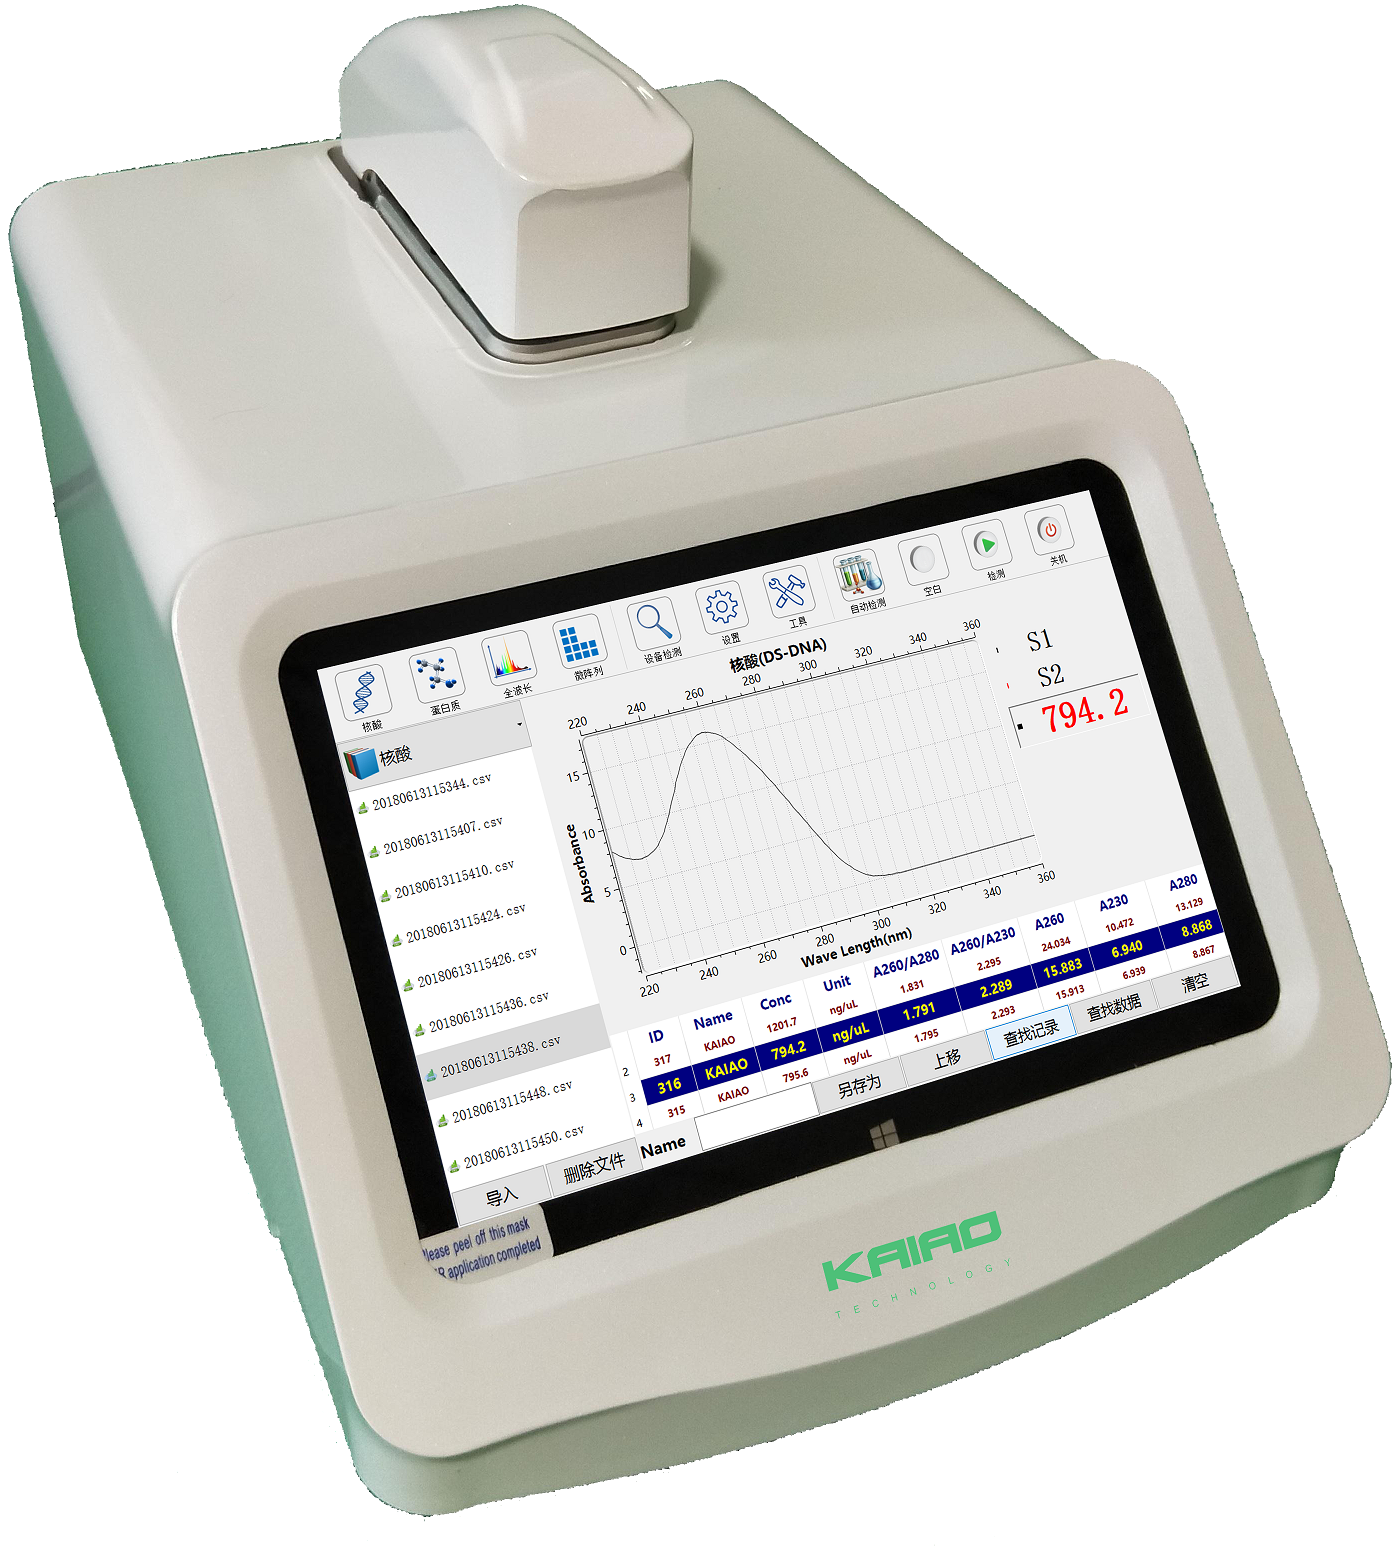 K5800T Micro-Spectrophotometer